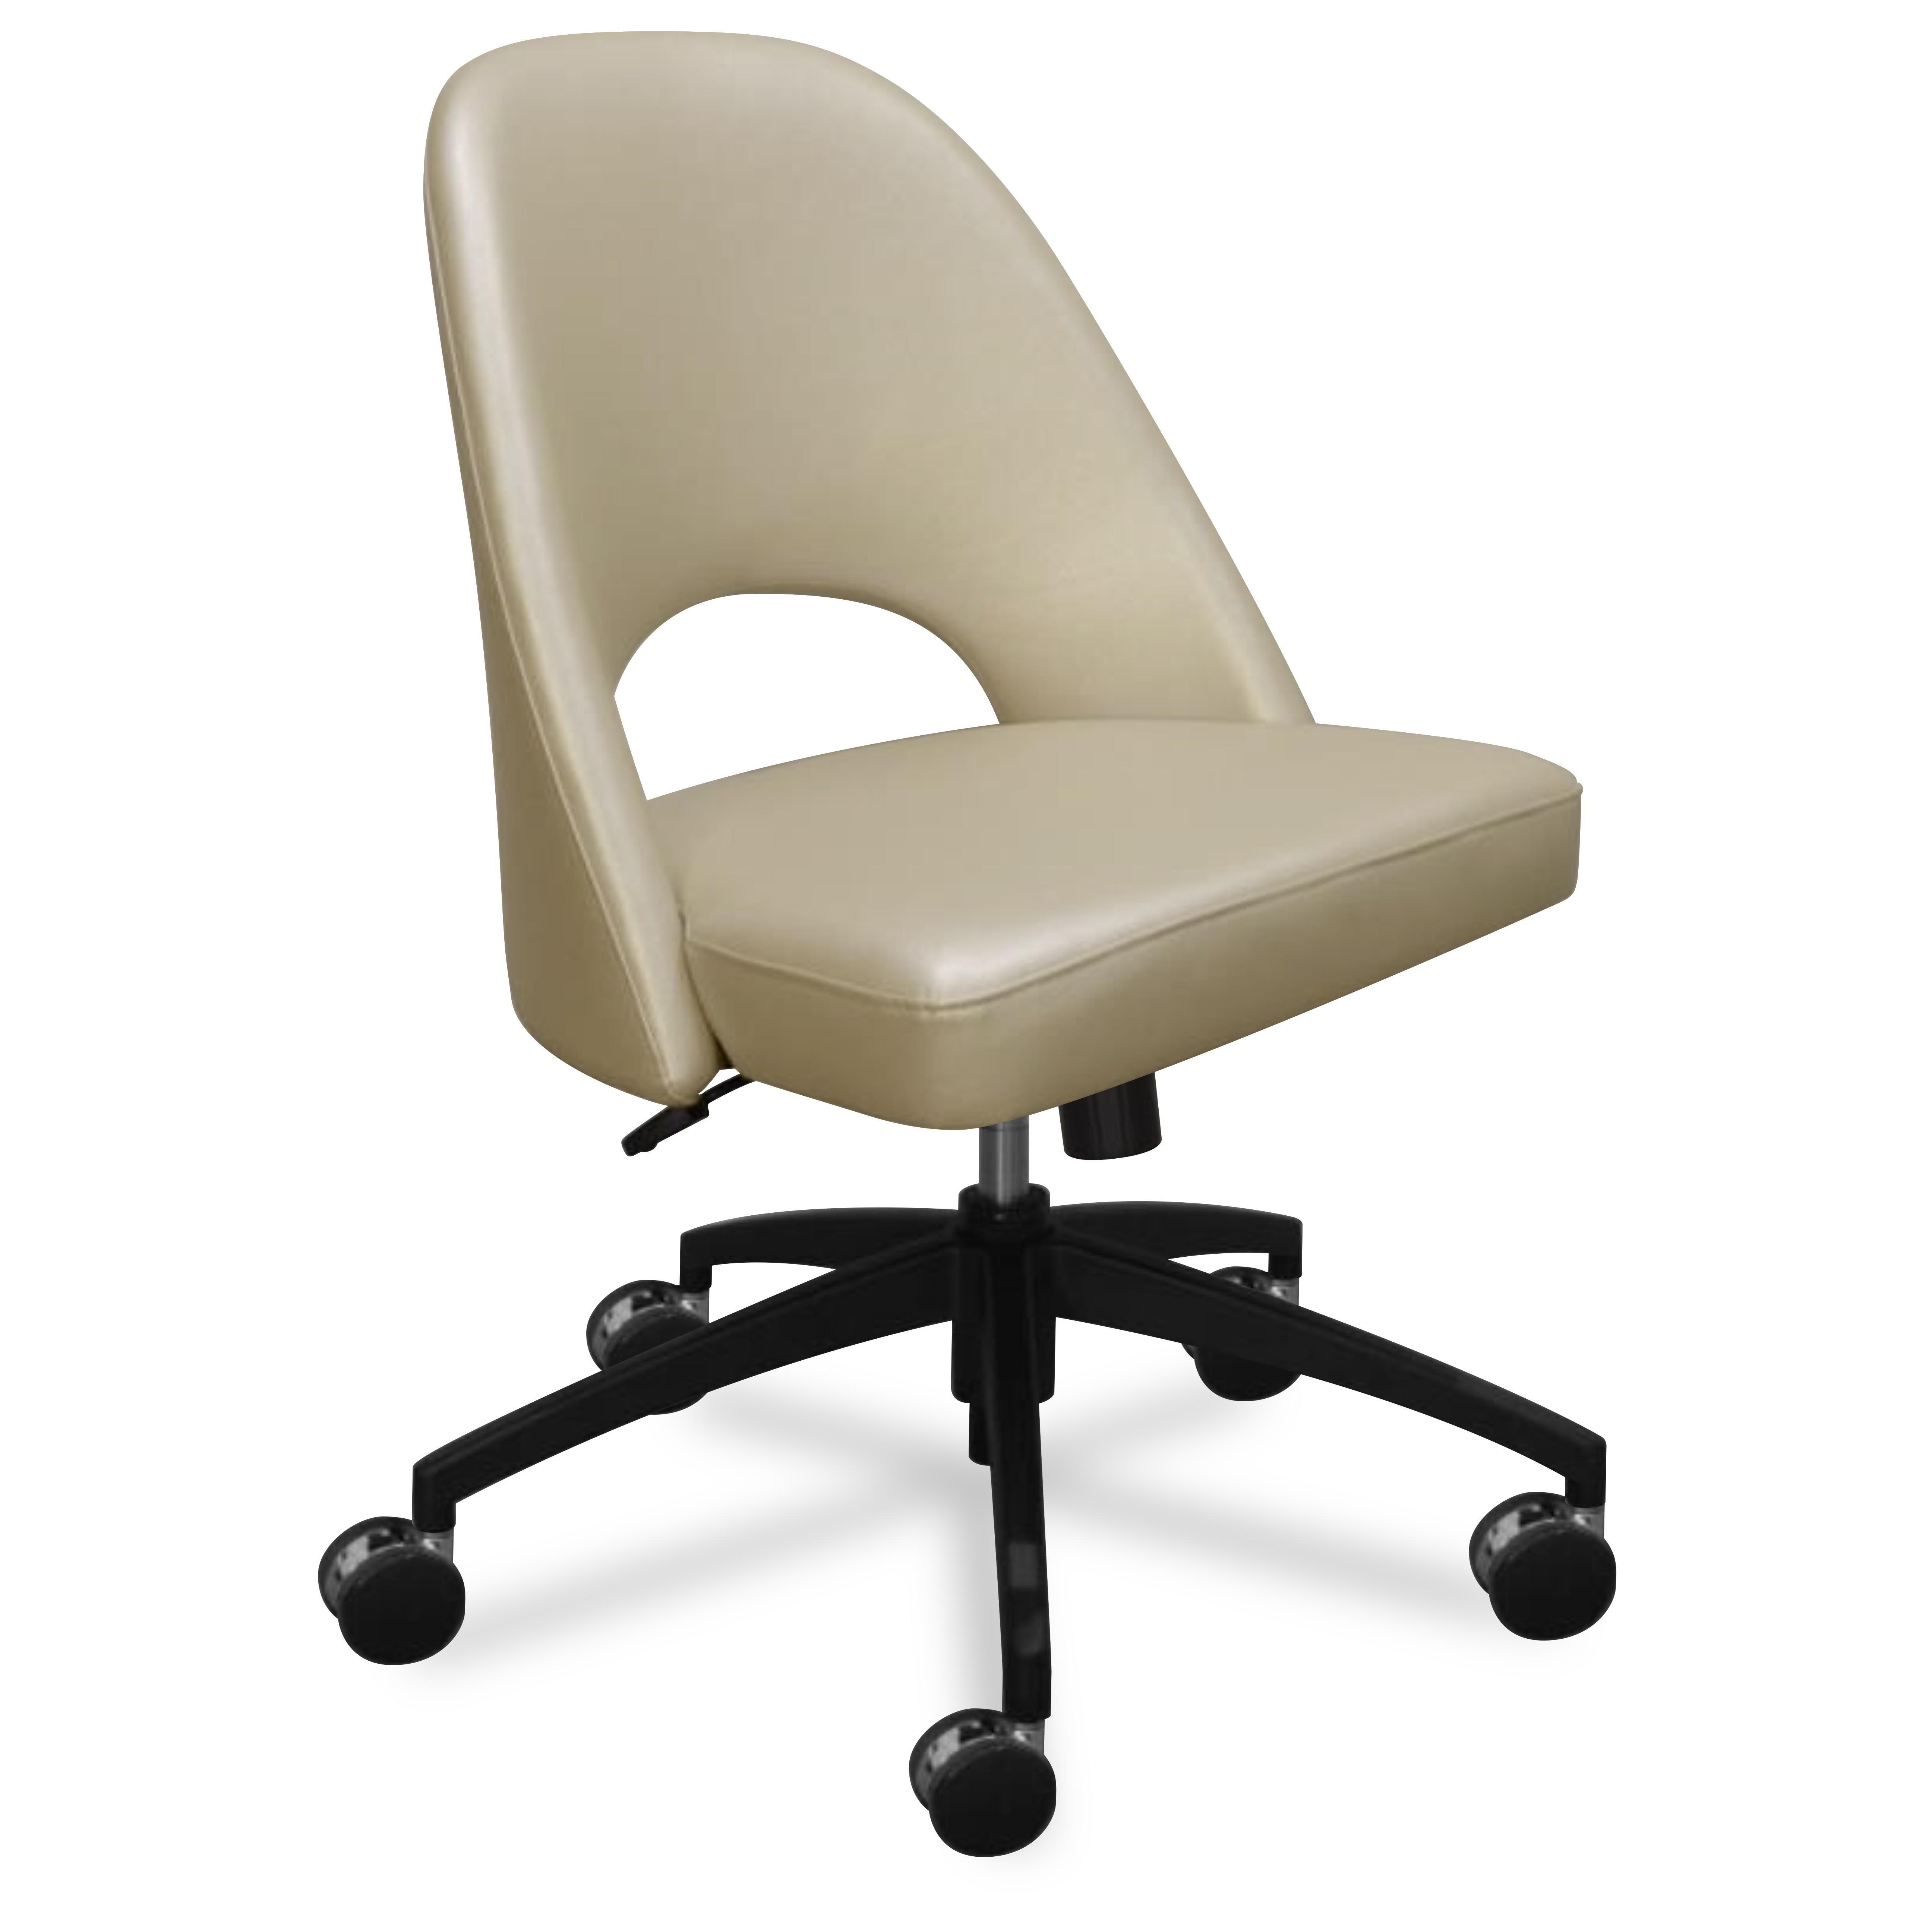 Charter Furniture Study Chair Furniture Chair